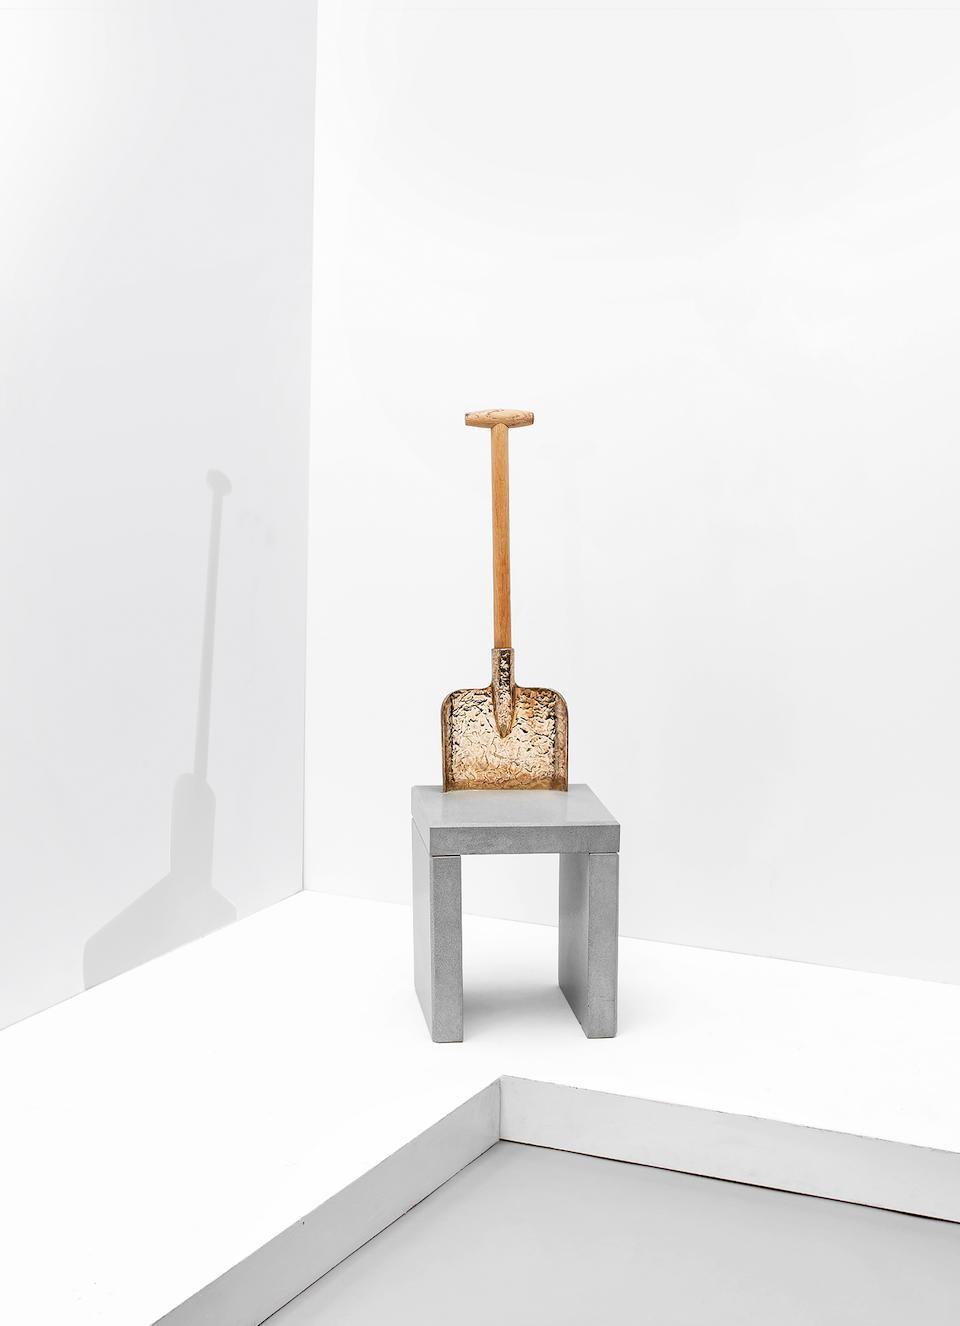 Studio Job Prototype 'Detour' chair, from the 'Detour' series, 2014